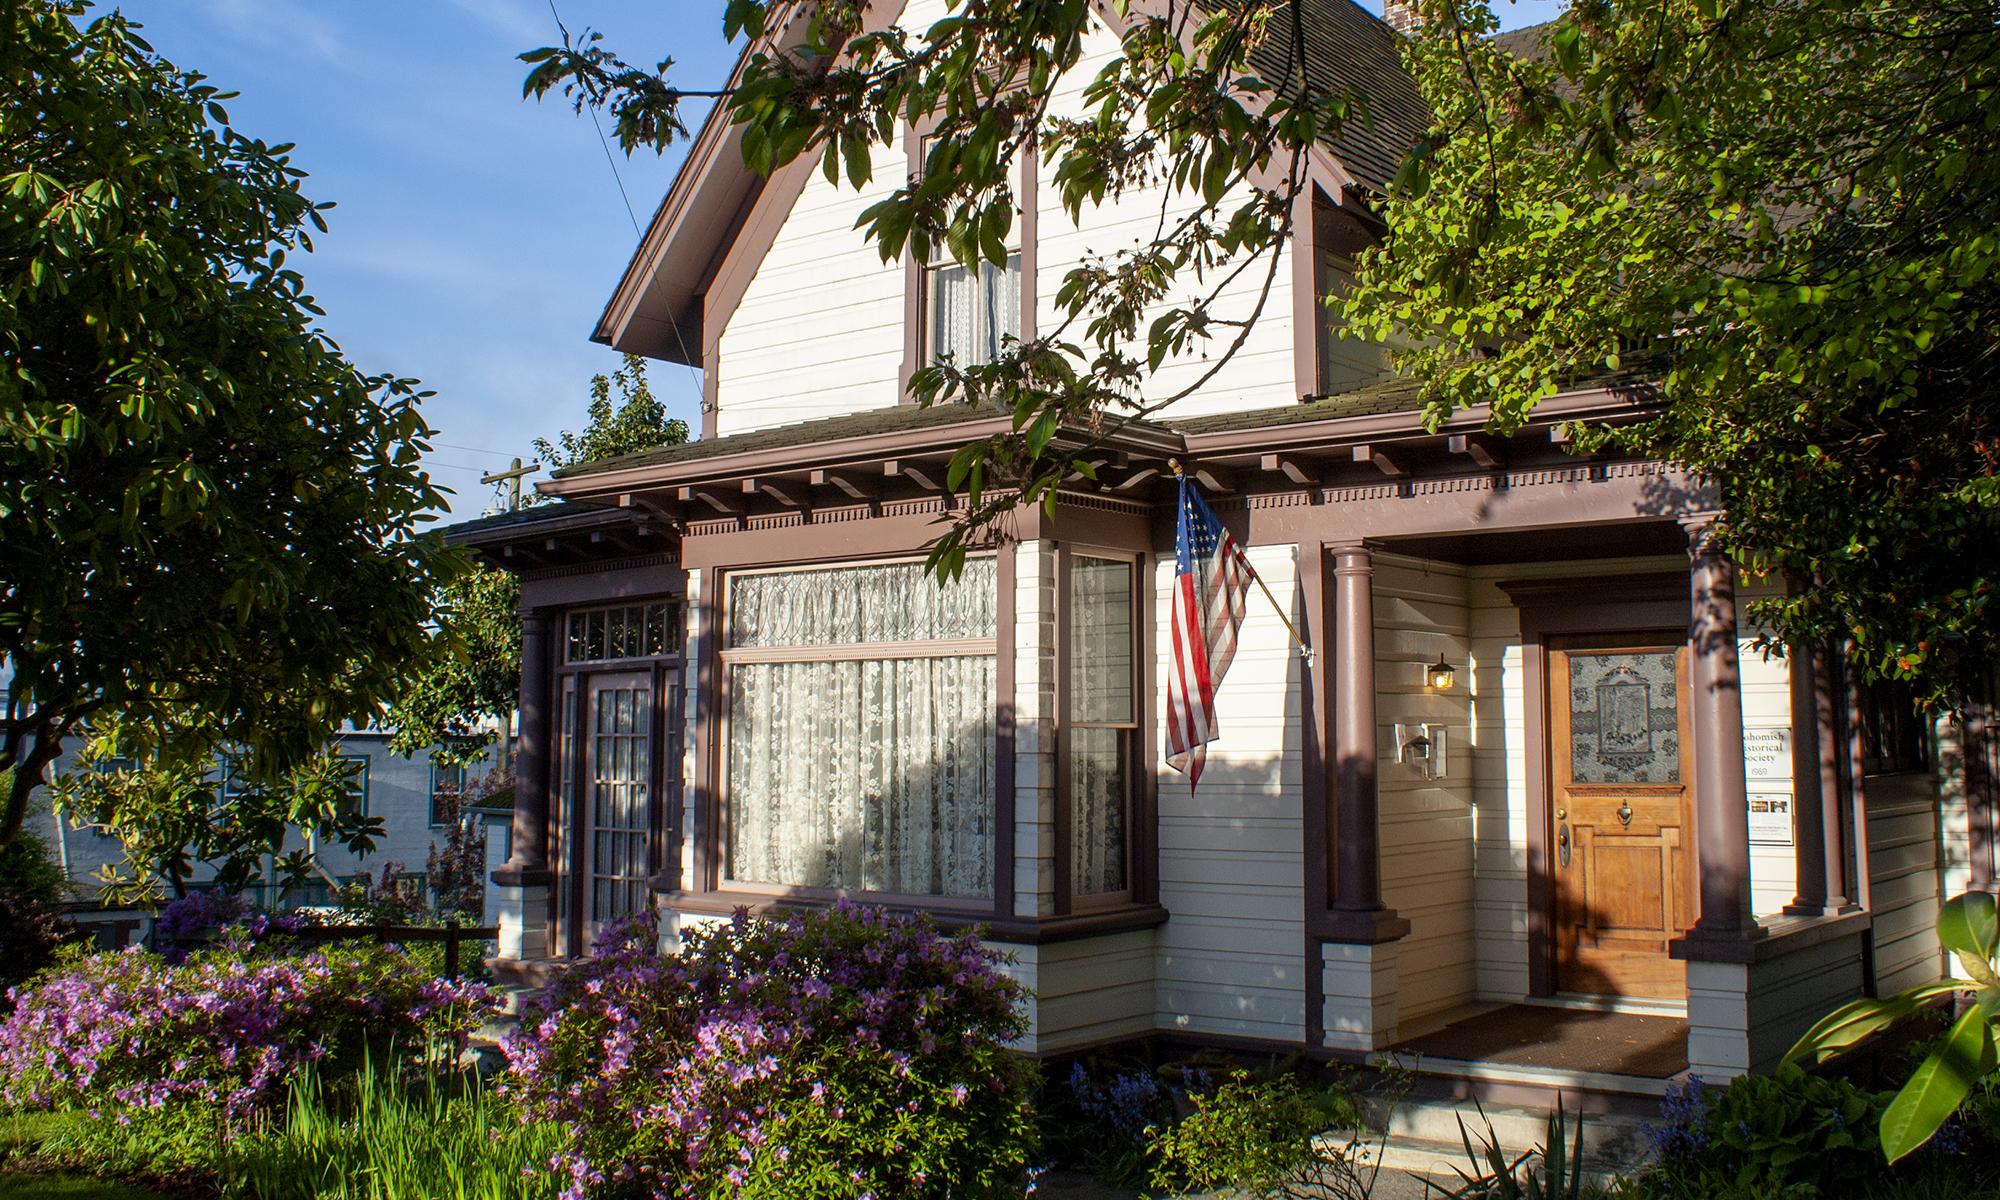 Snohomish Historical Society